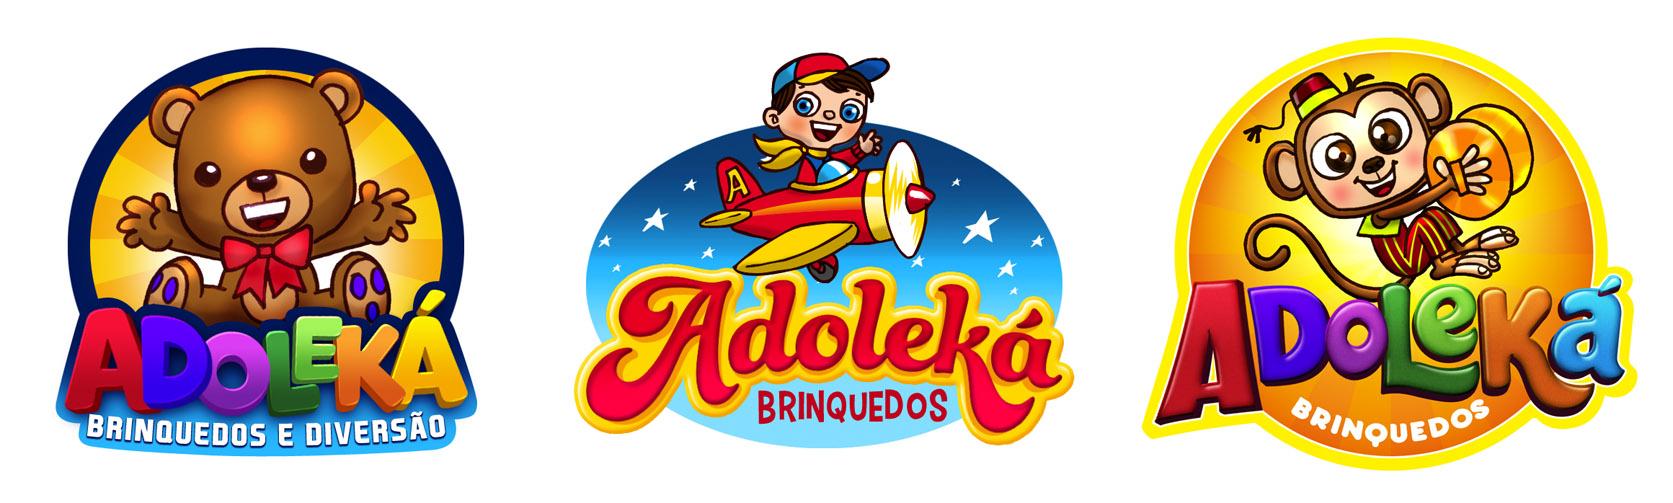 Adoleka01